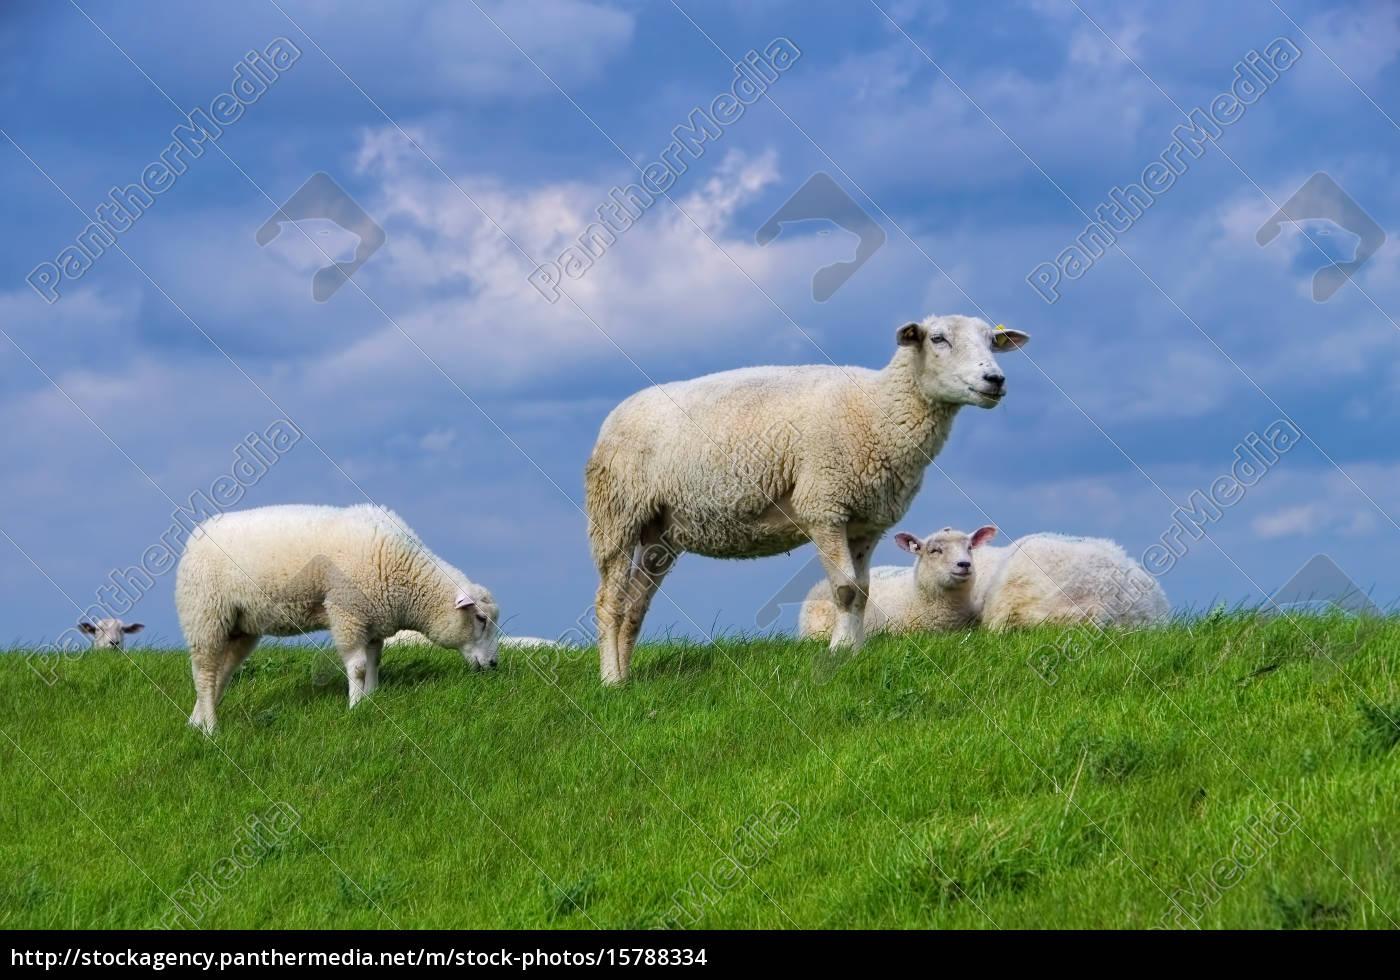 ostfriesland, sheep, -, eastern, friesland, sheeps - 15788334